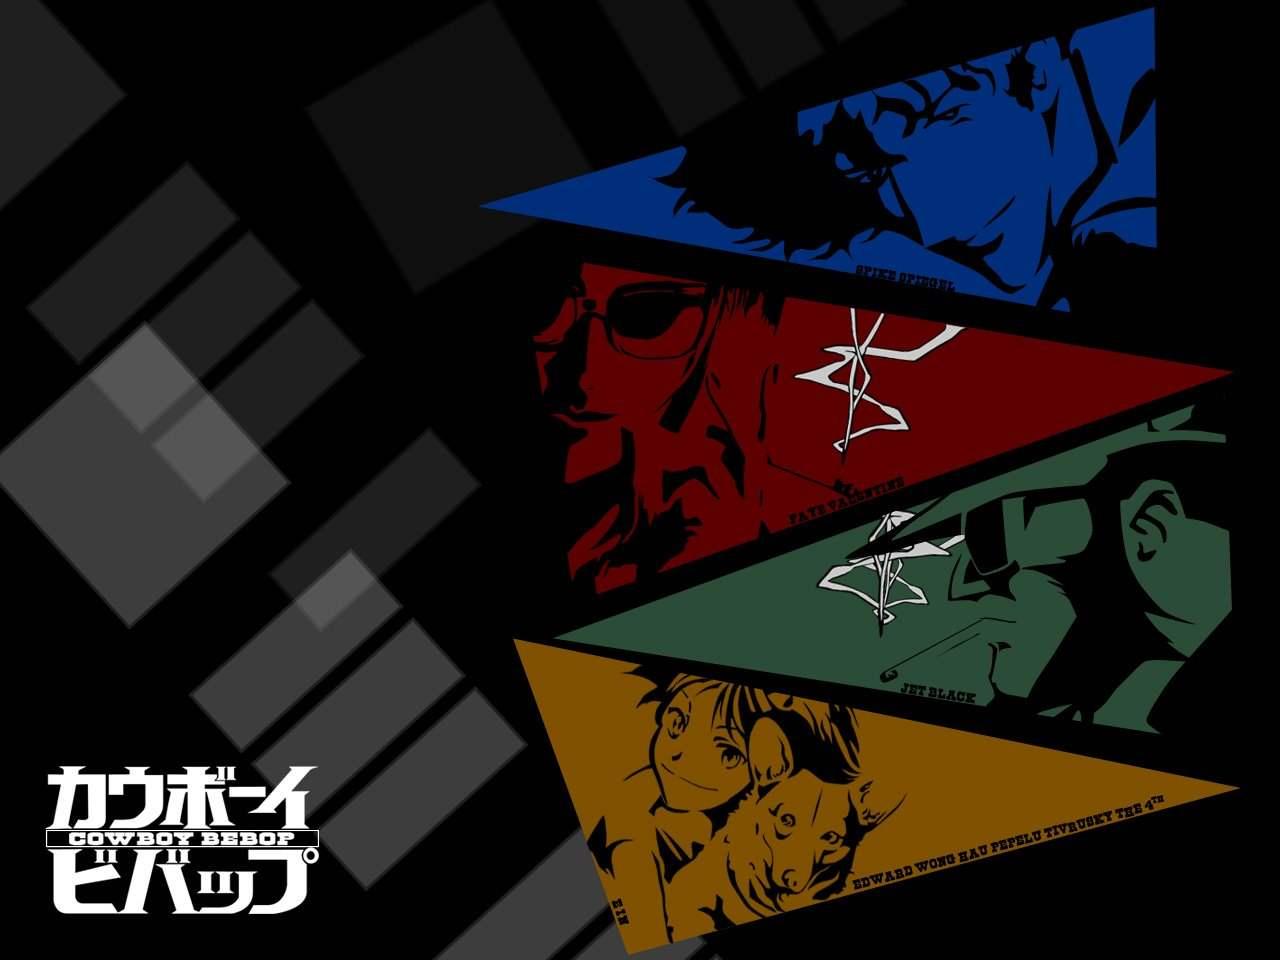 the Cowboy Bebop anime wallpaper titled Cowboy Bebop Wallpaper 1280x960